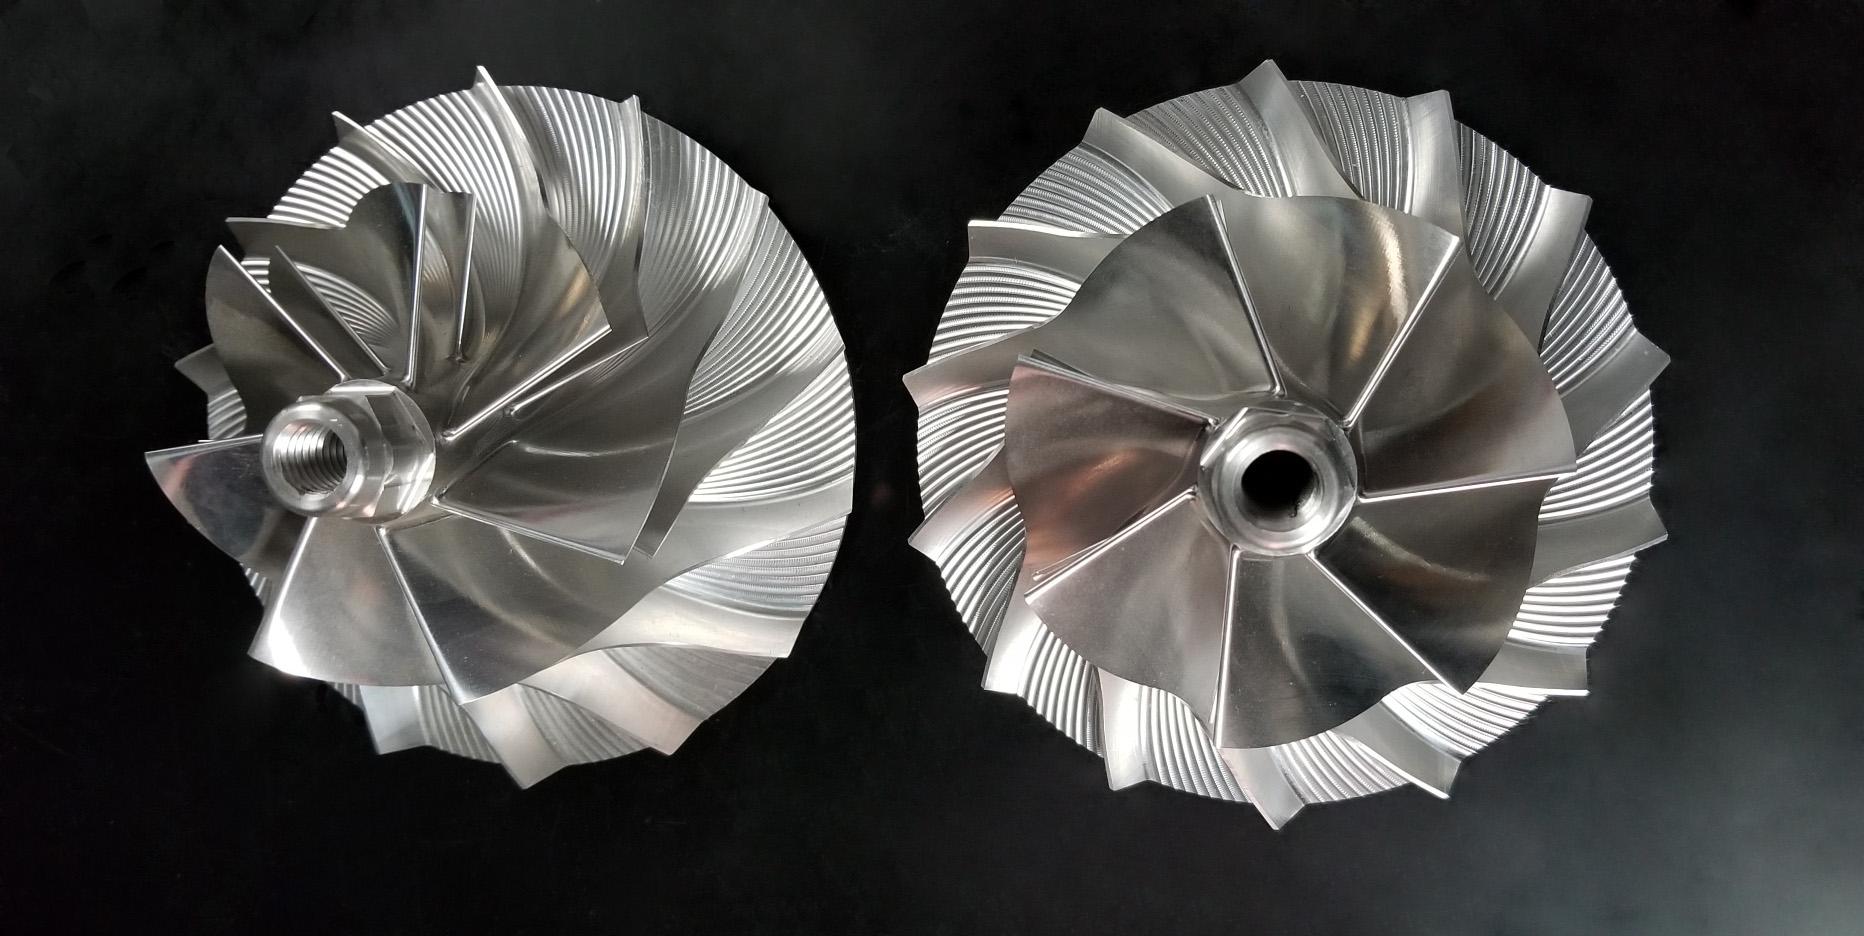 compressor-wheel-4.jpg